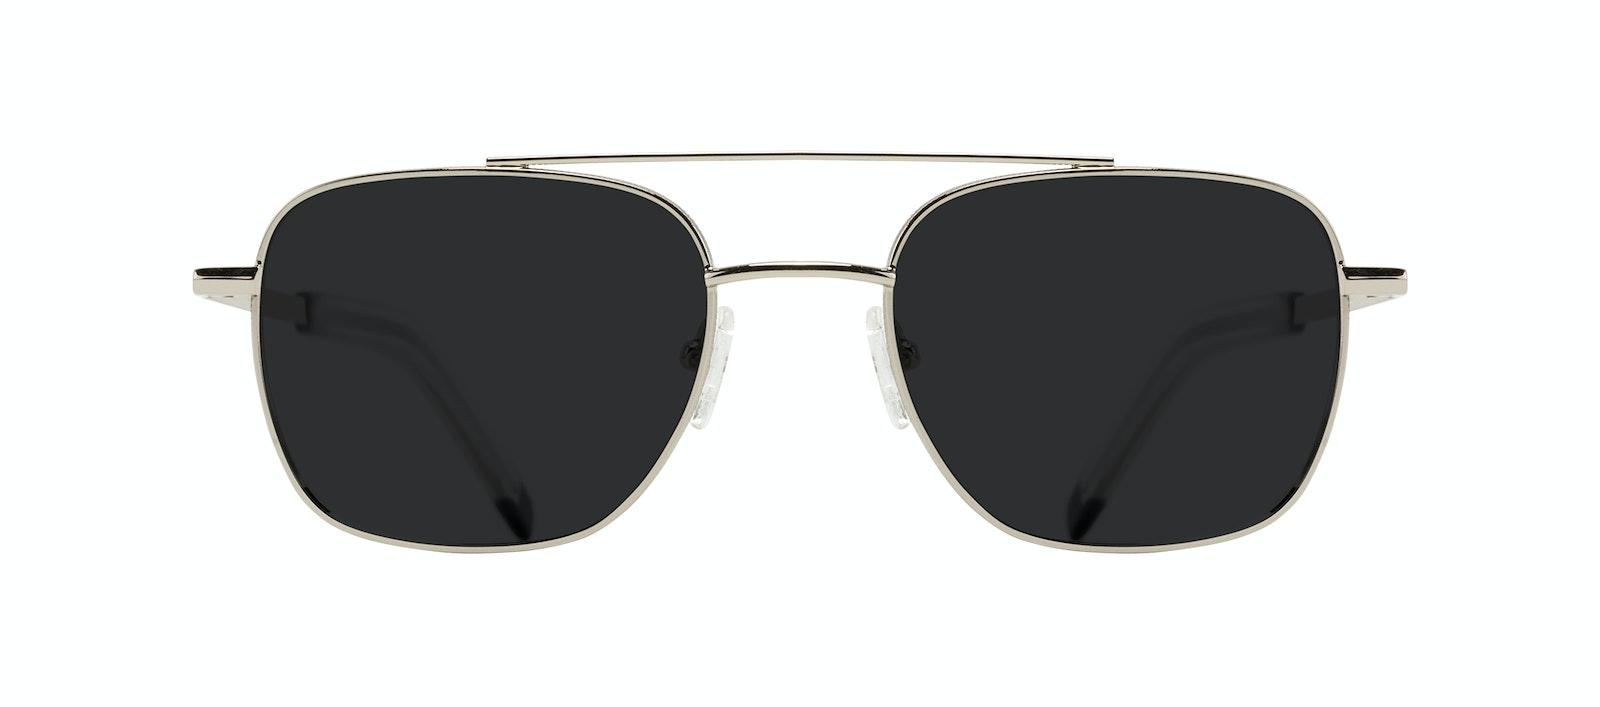 Affordable Fashion Glasses Aviator Sunglasses Men Drift Silver Front